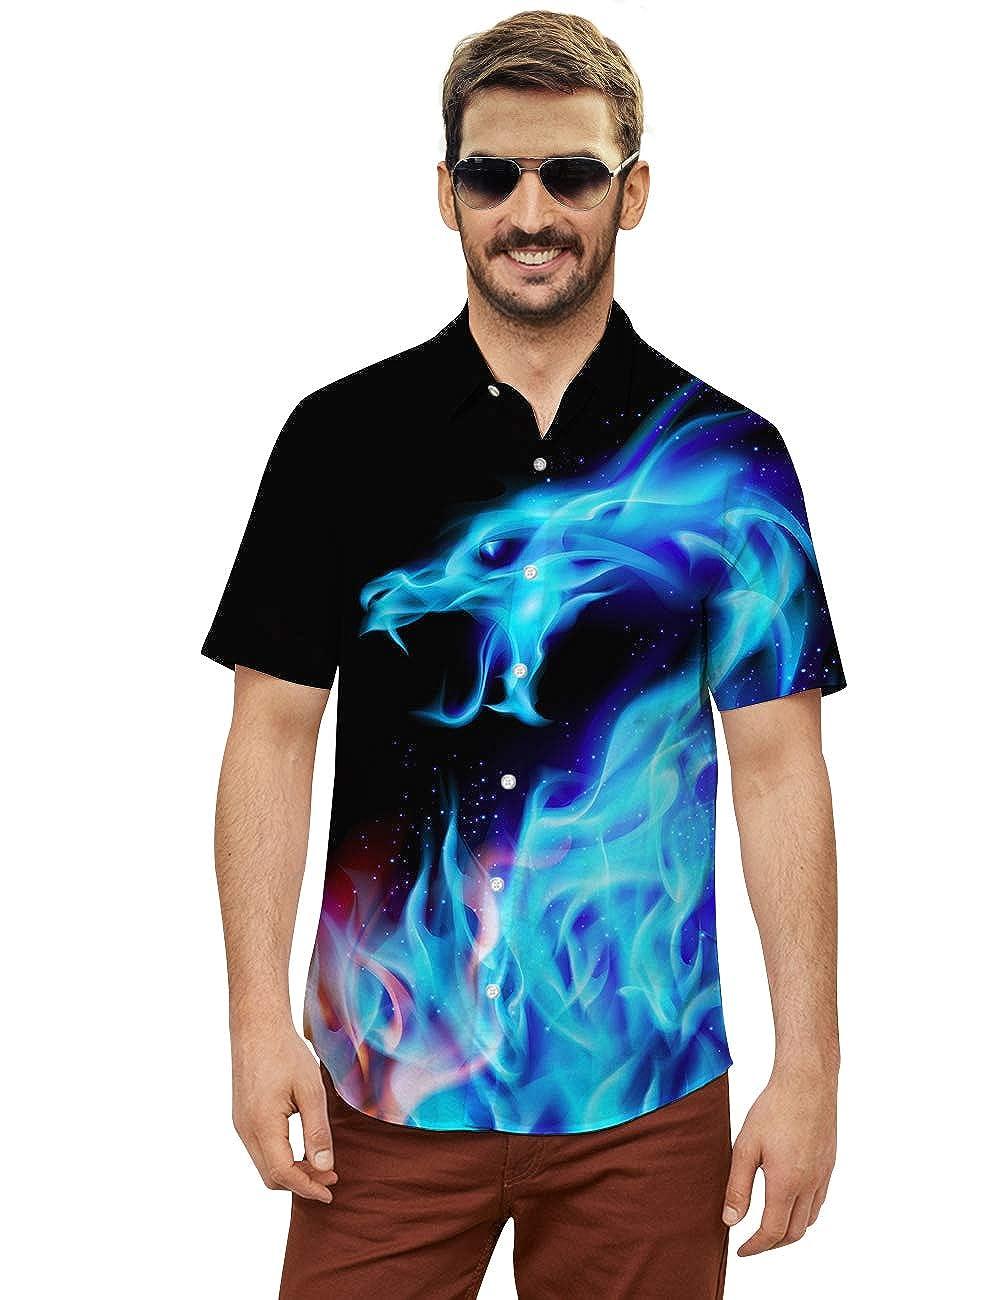 Goodstoworld 2020 Mens Button Down Shortsleeve Unique Hawaiian Shirts